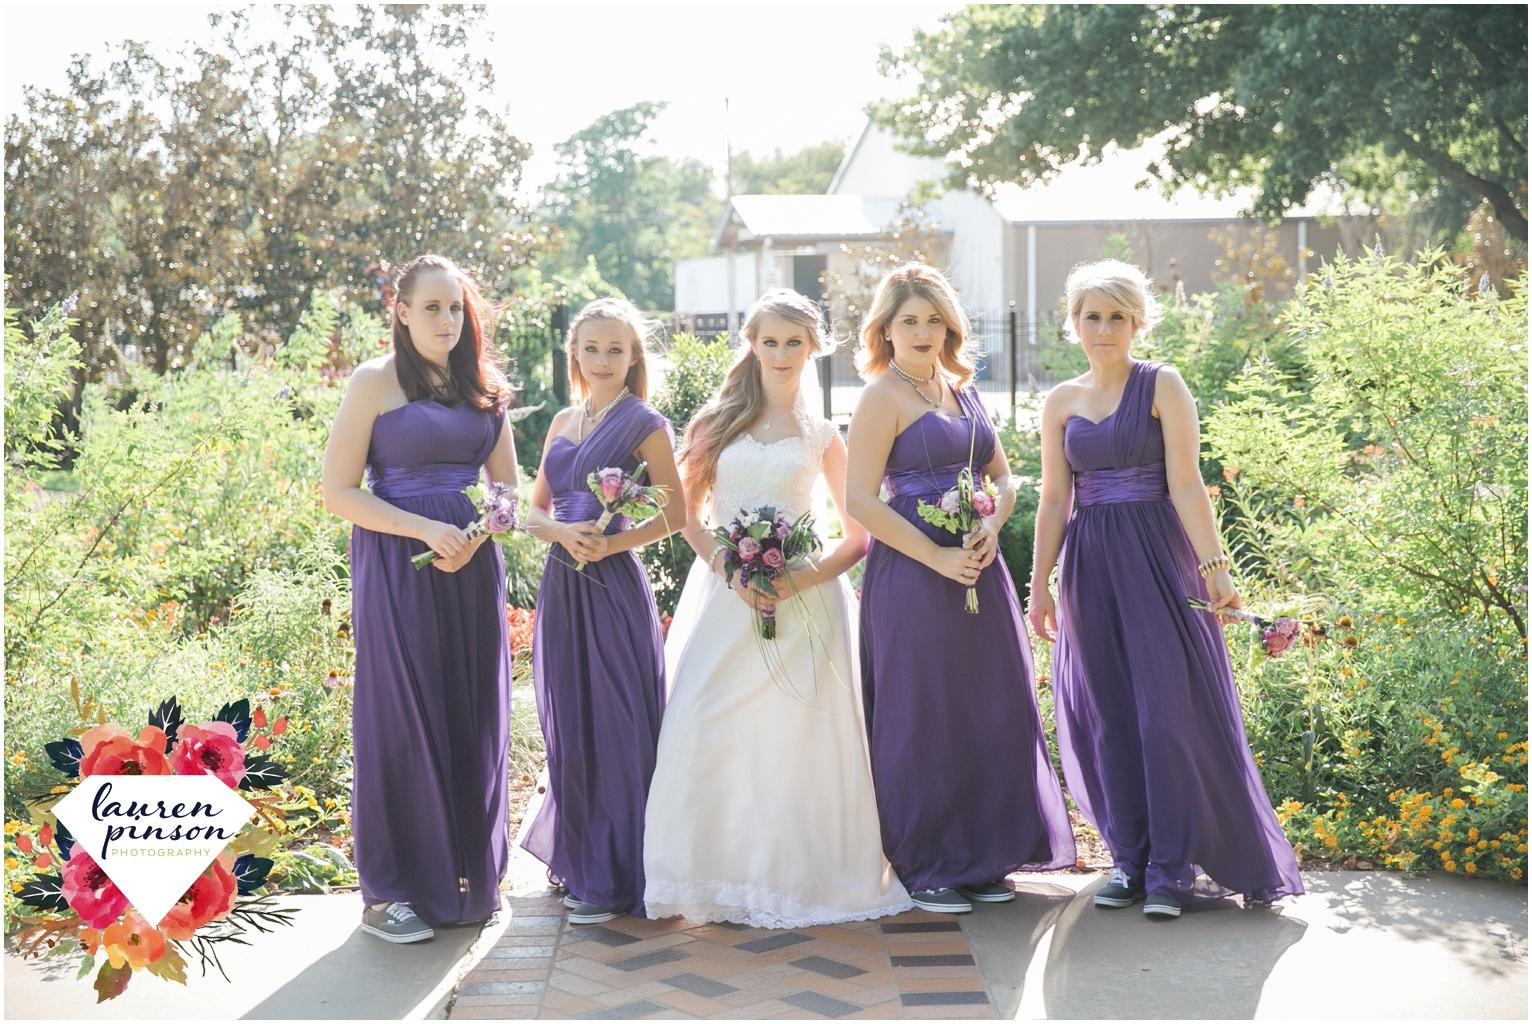 wichita-falls-wedding-photography-at-fain-presbyterian-church-and-the-wellington-timeless-classic-modern-photographer_1234.jpg